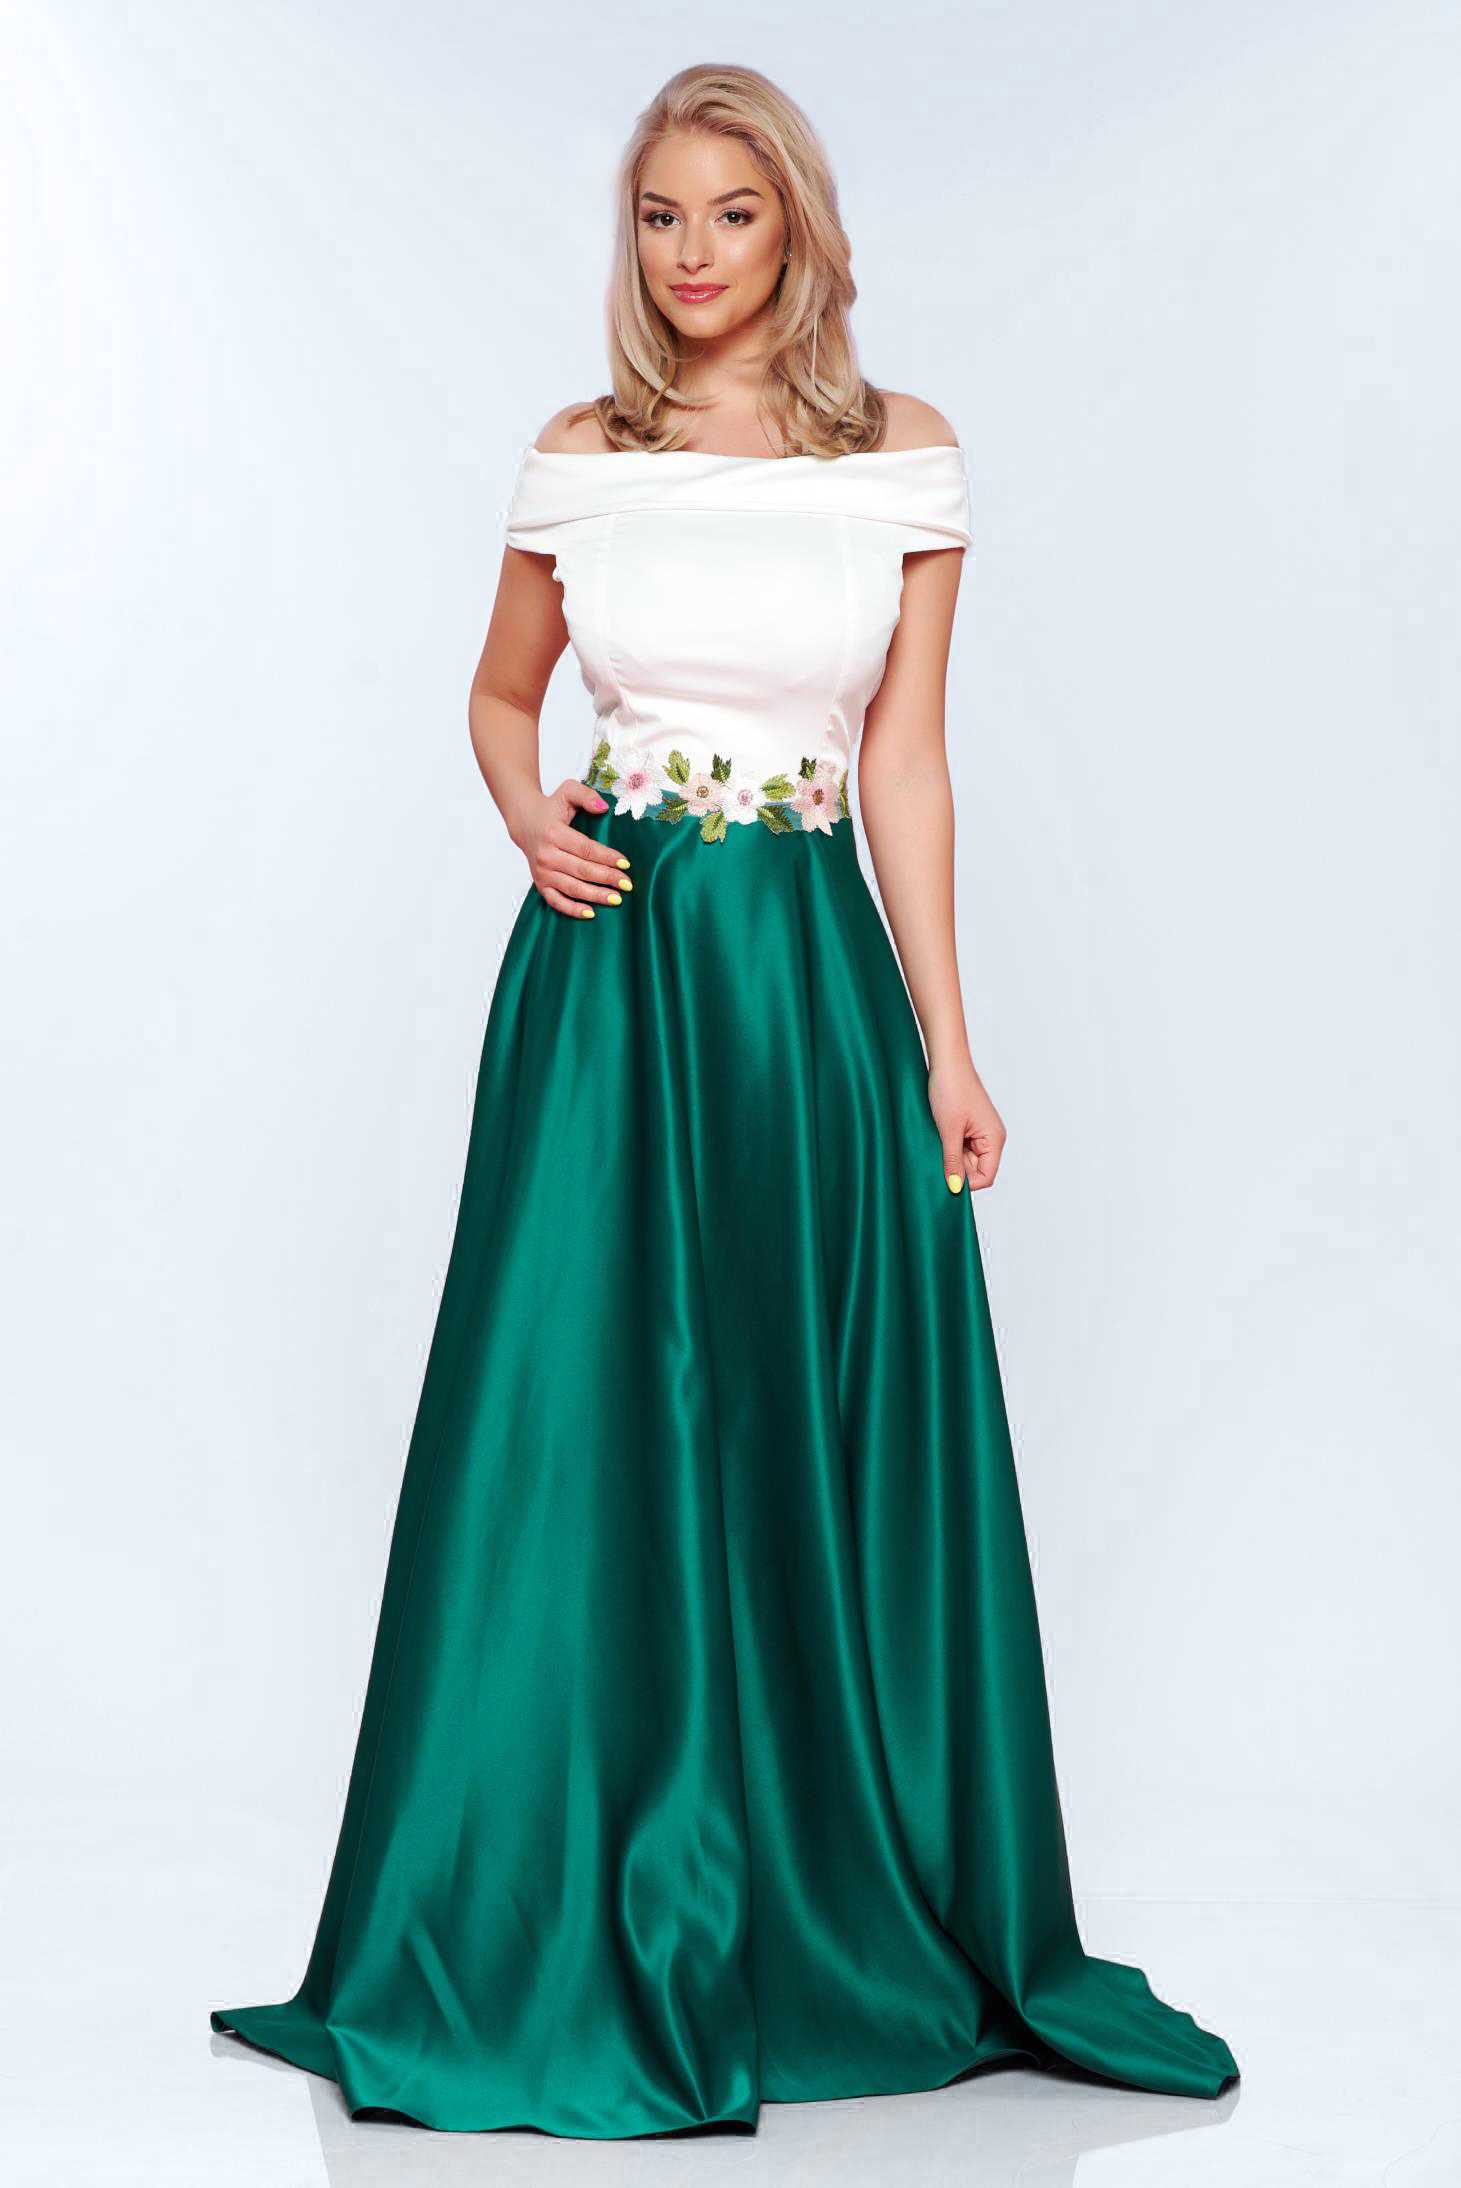 Rochie verde de ocazie in clos din material satinat cu insertii de broderie